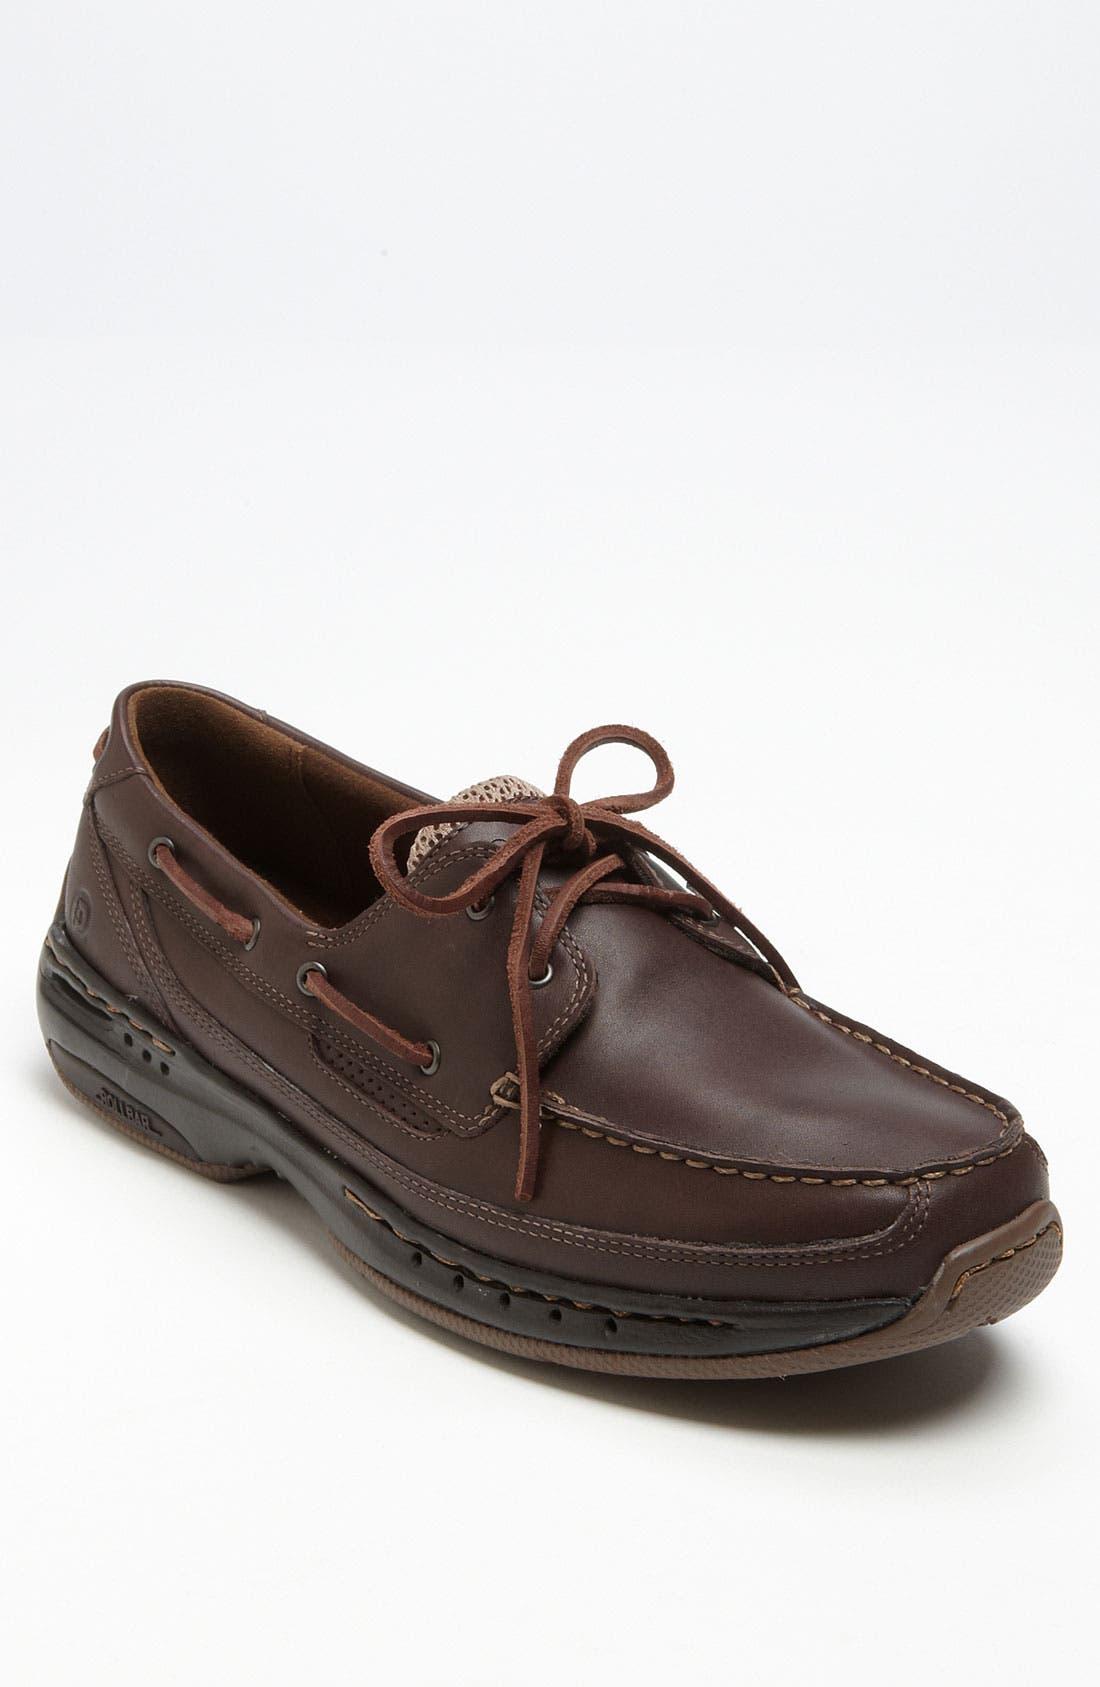 Alternate Image 1 Selected - Dunham 'Shoreline' Boat Shoe (Online Only)